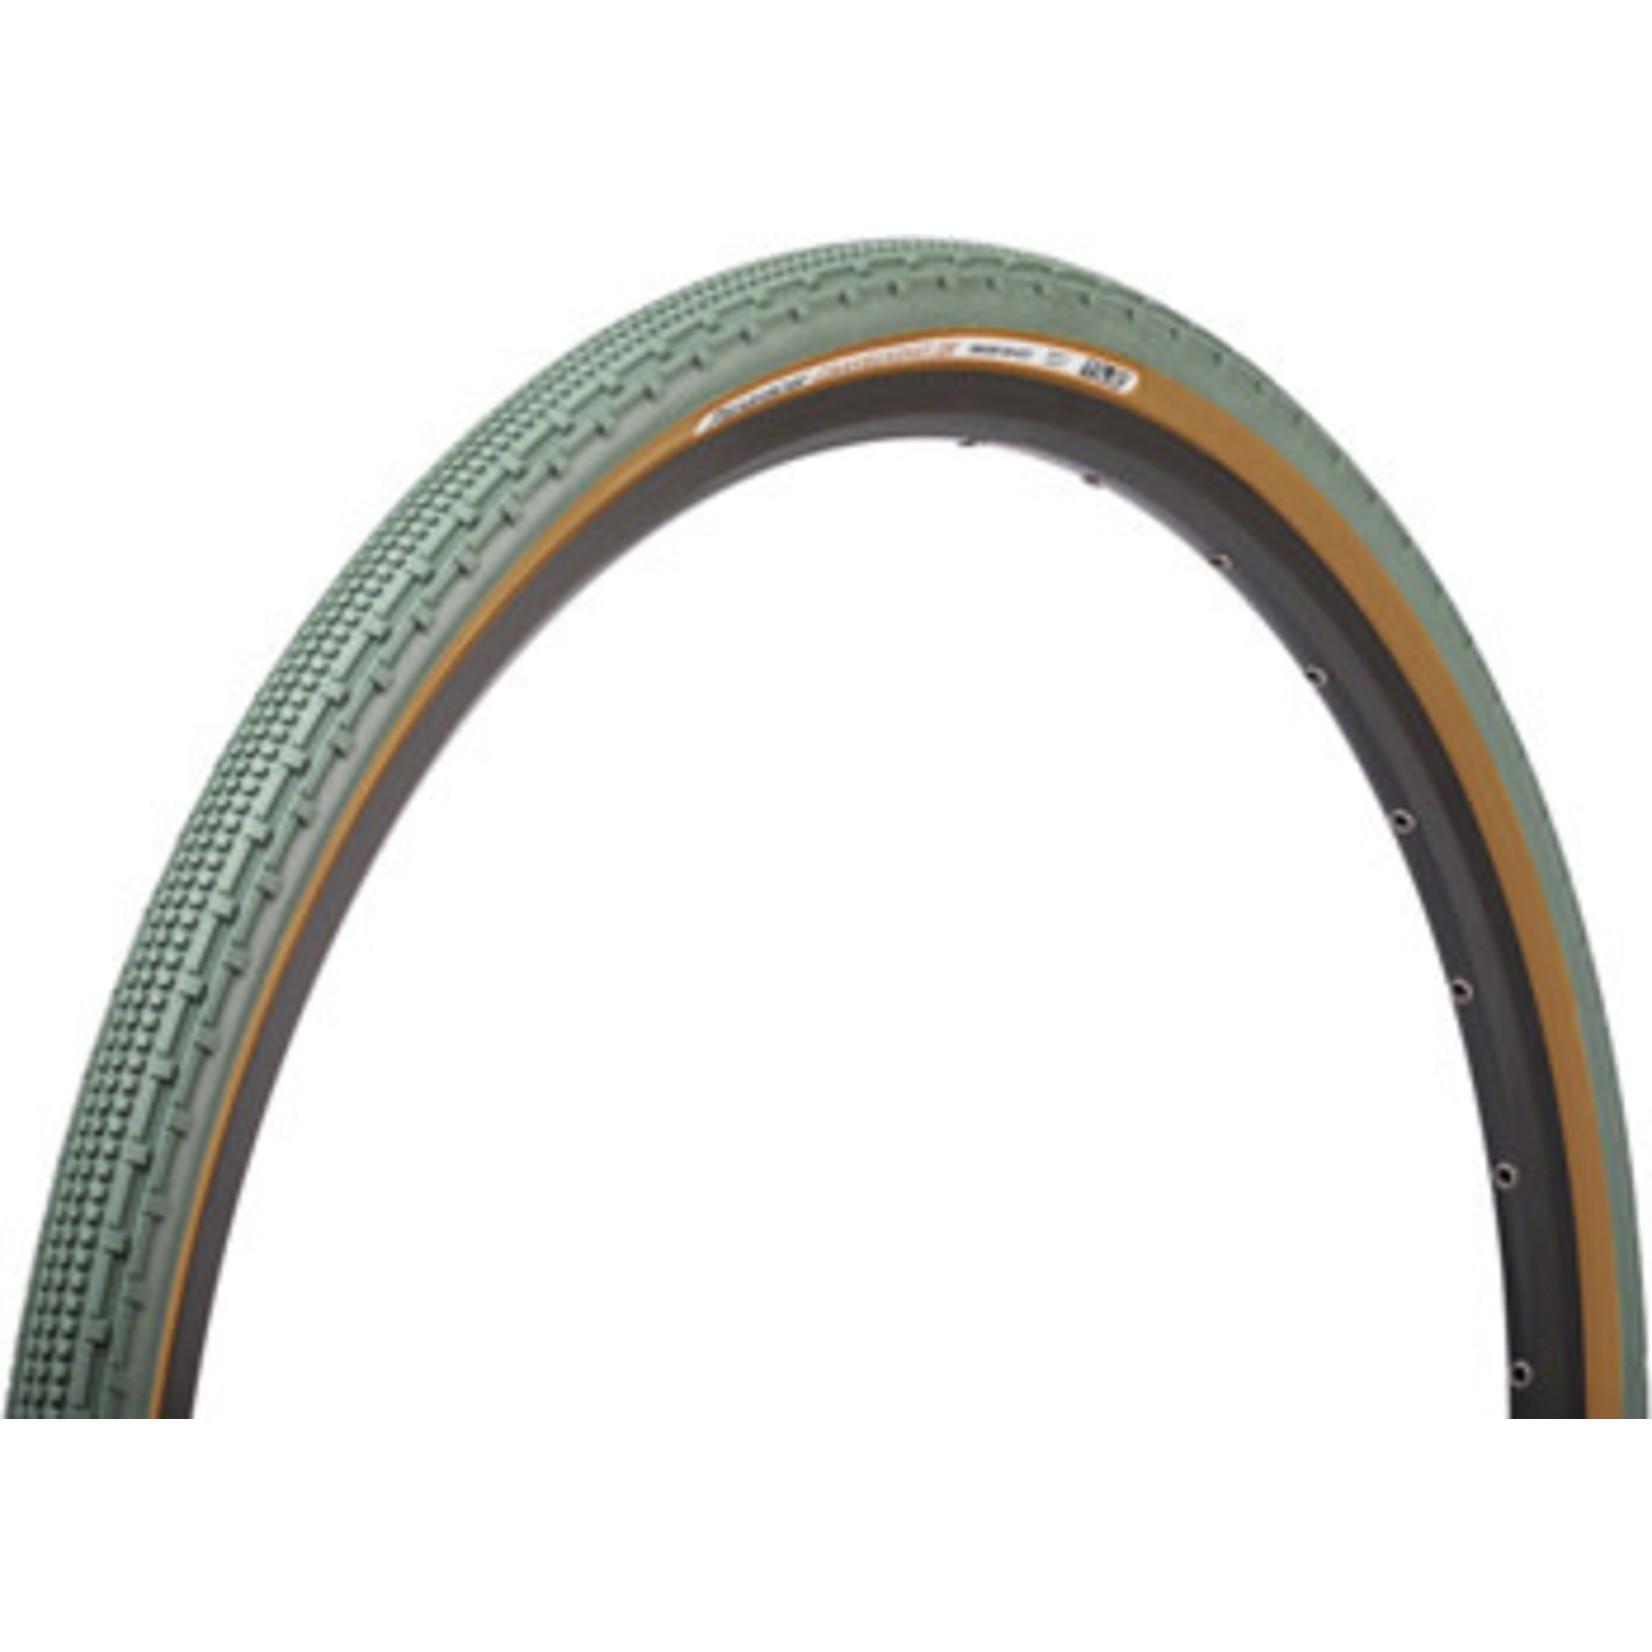 Panaracer Gravelking SK Tire, 700x43c - Olive/Brown  NLA